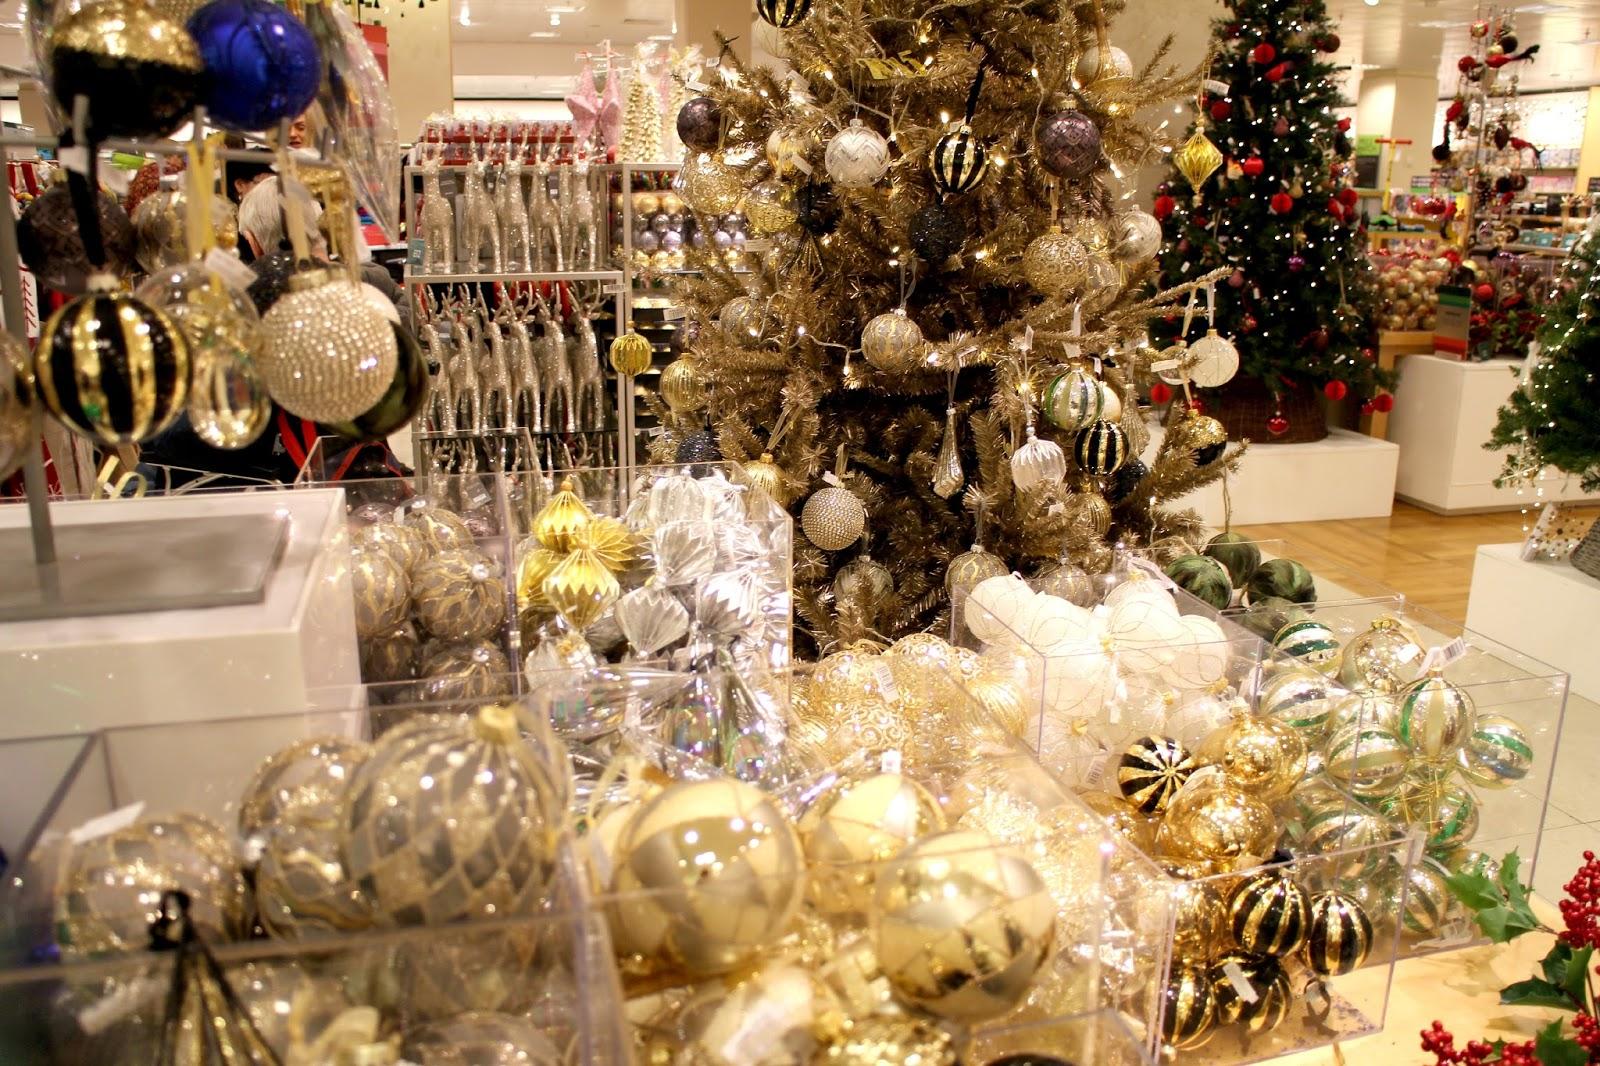 The John Lewis Christmas Shop